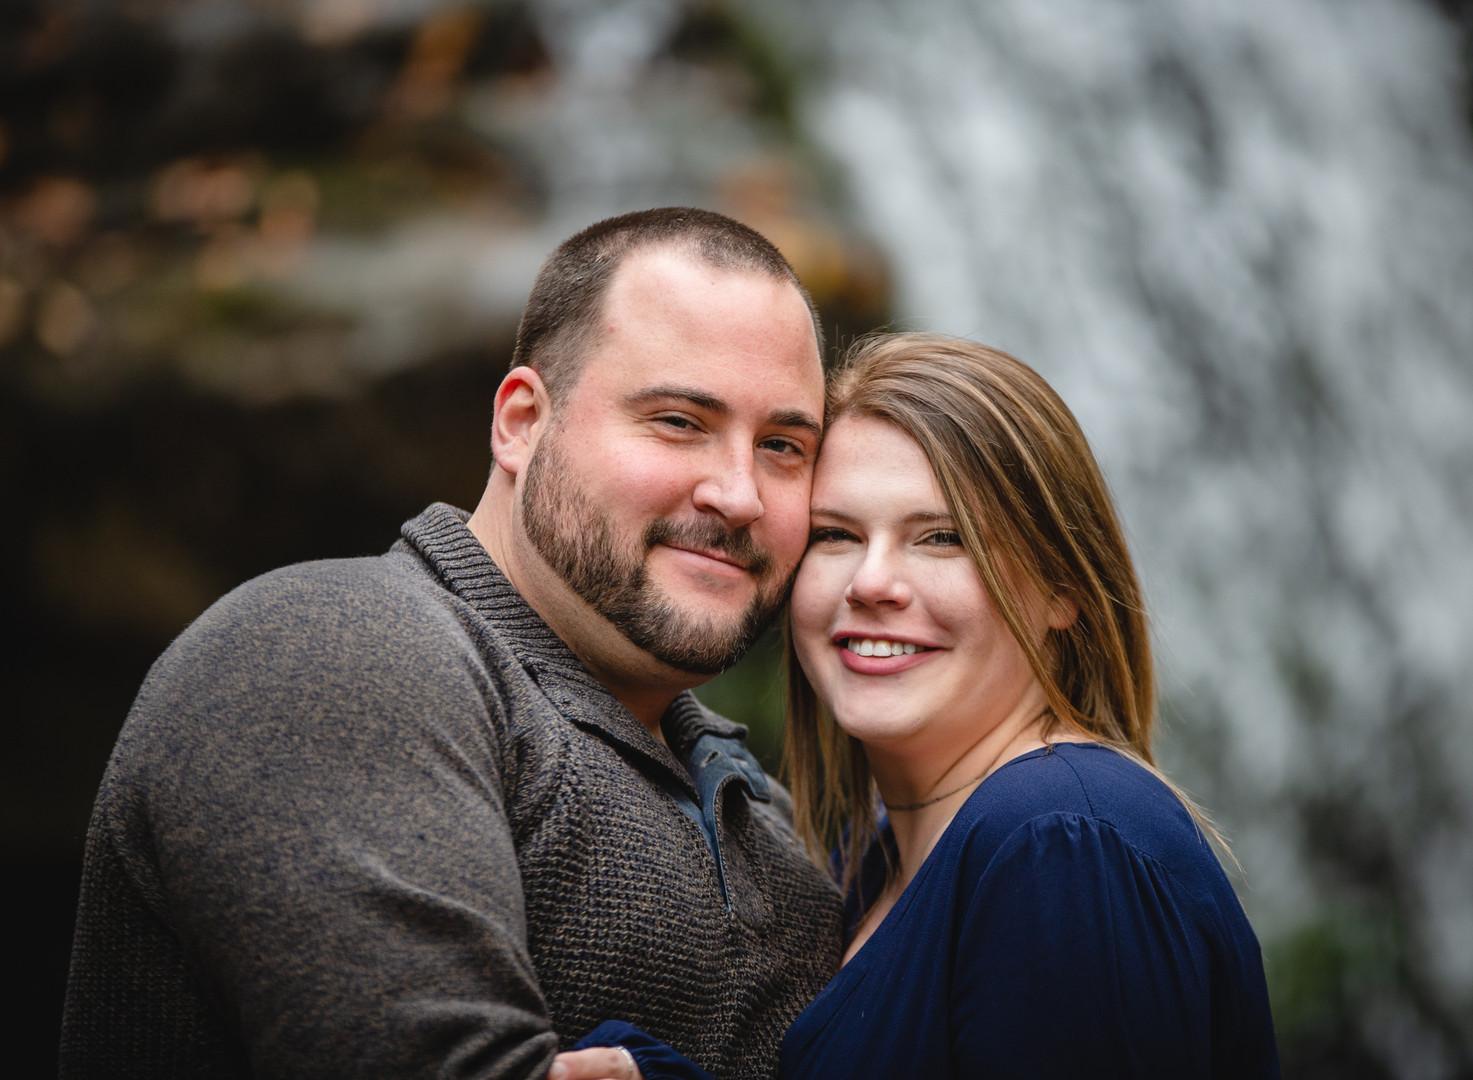 engagement portrait of couple hugging